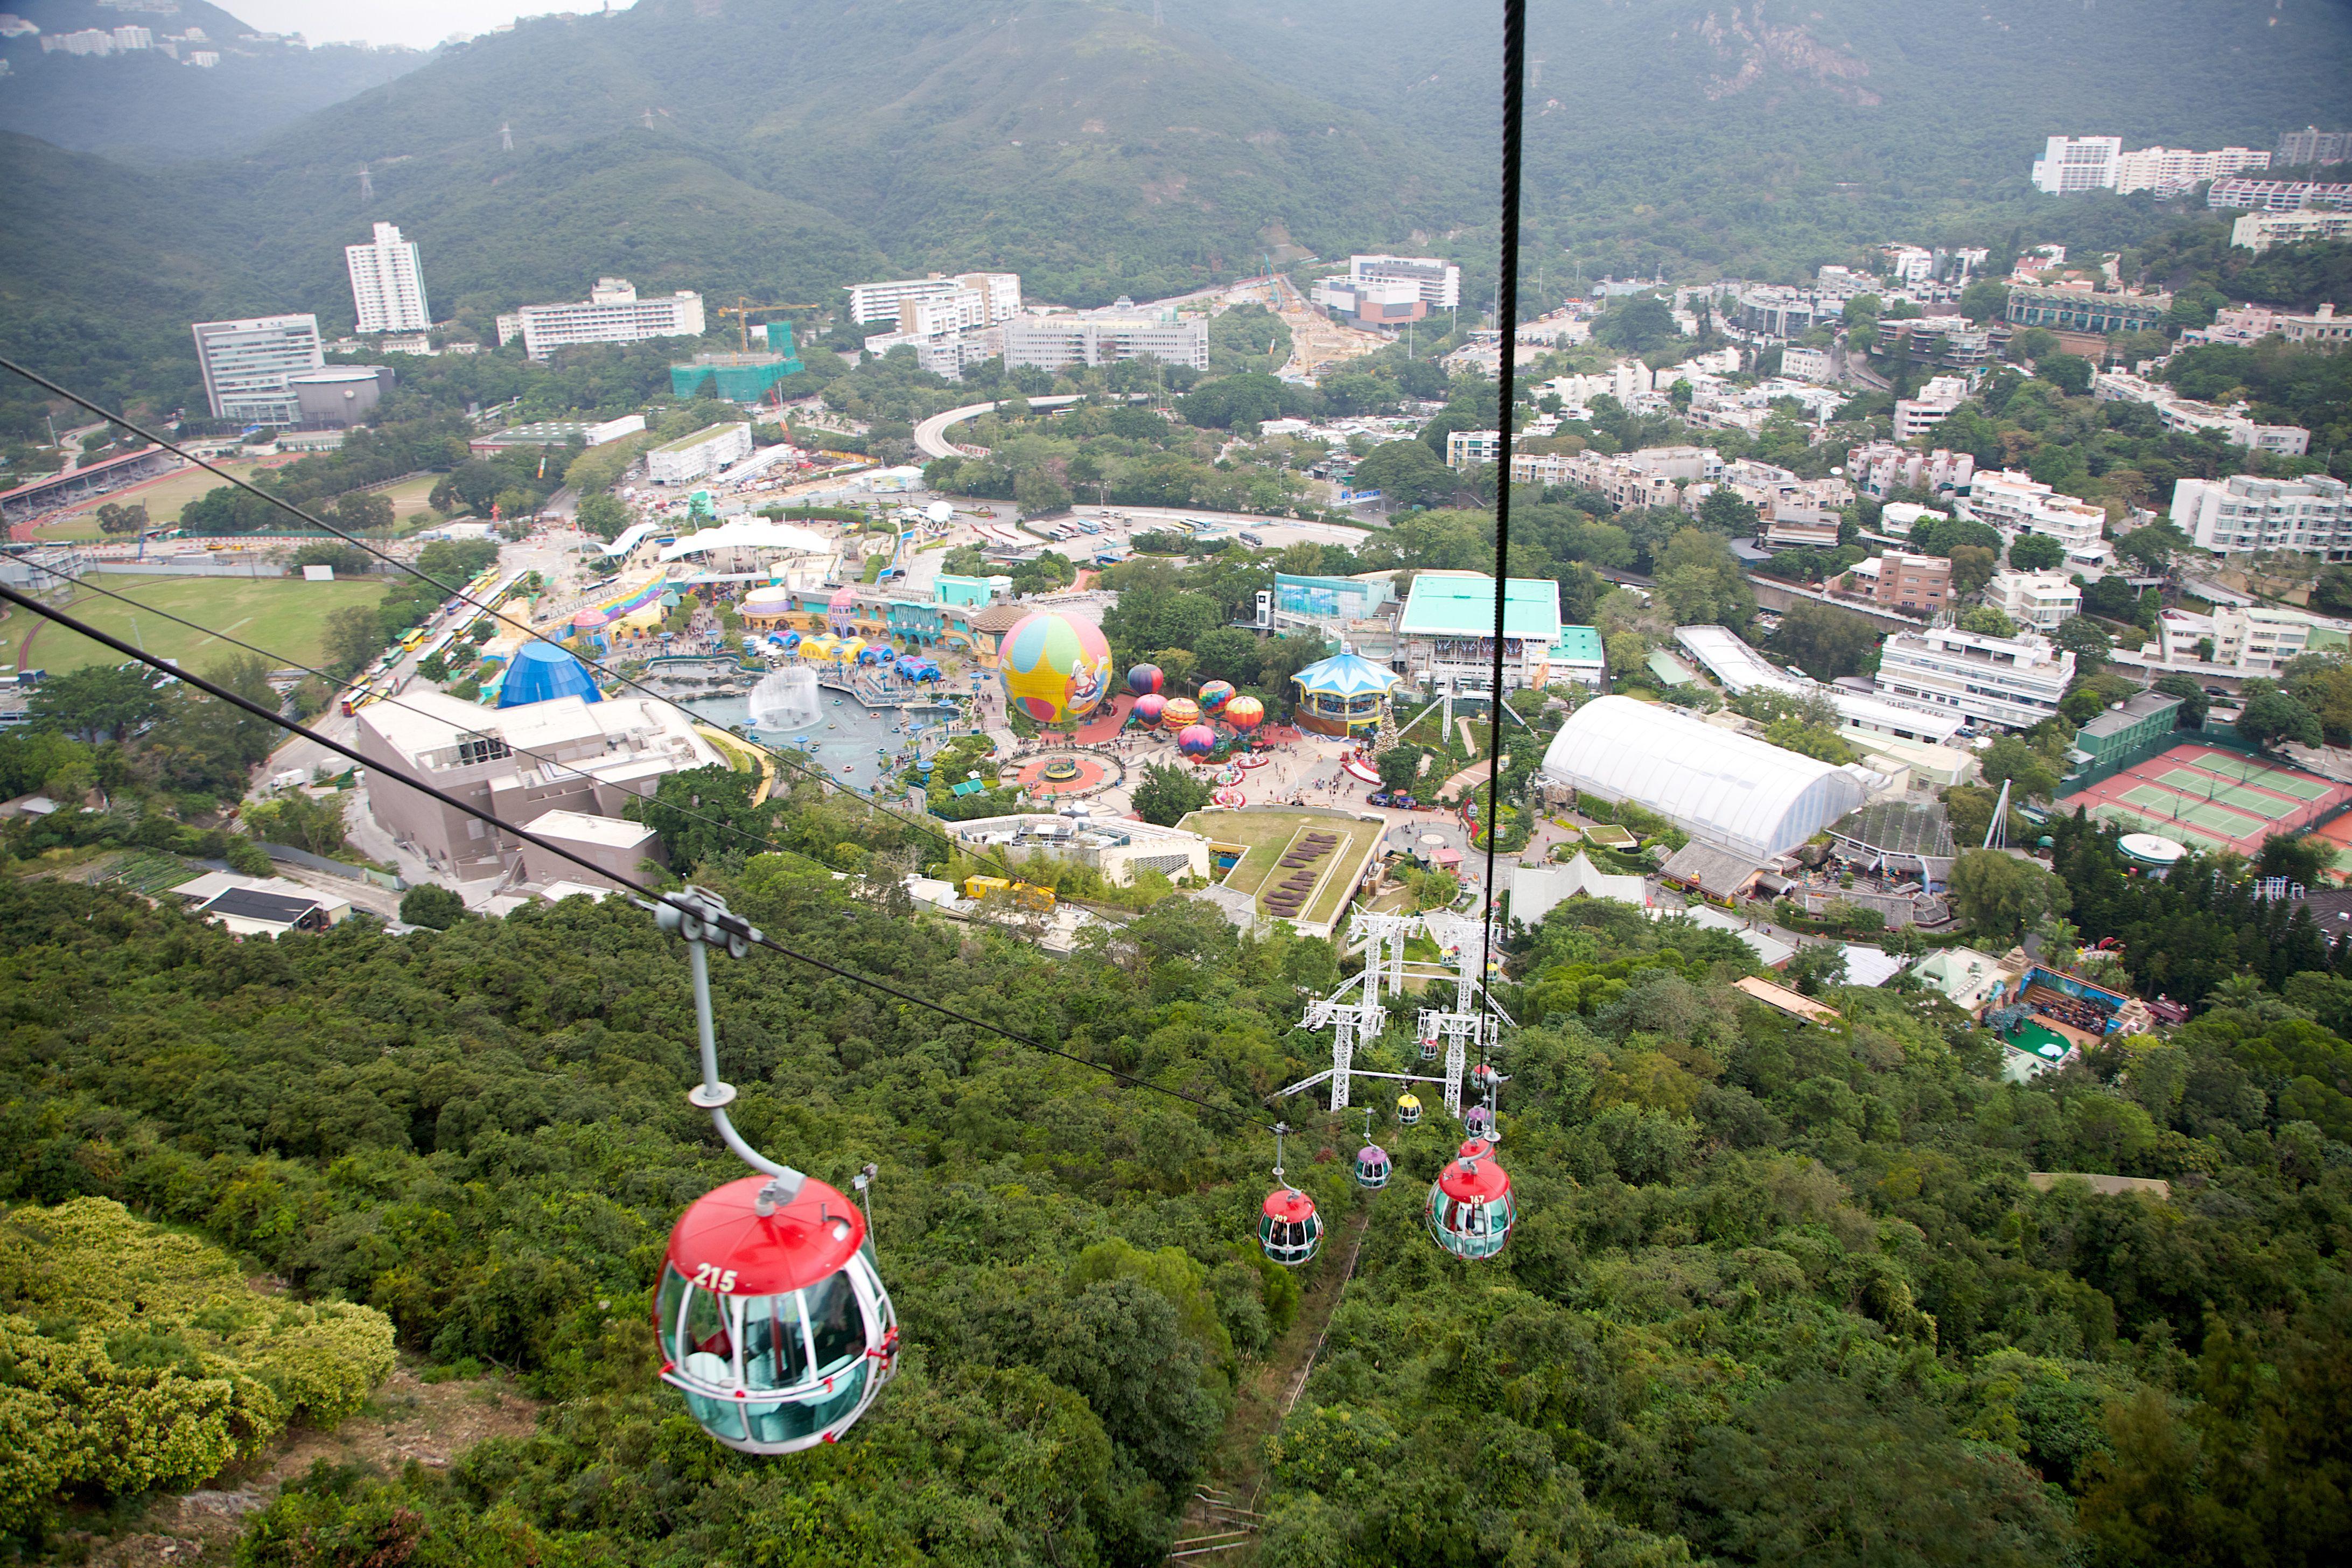 Ocean Park's cable car provides views of Hong Kong Island and the park.